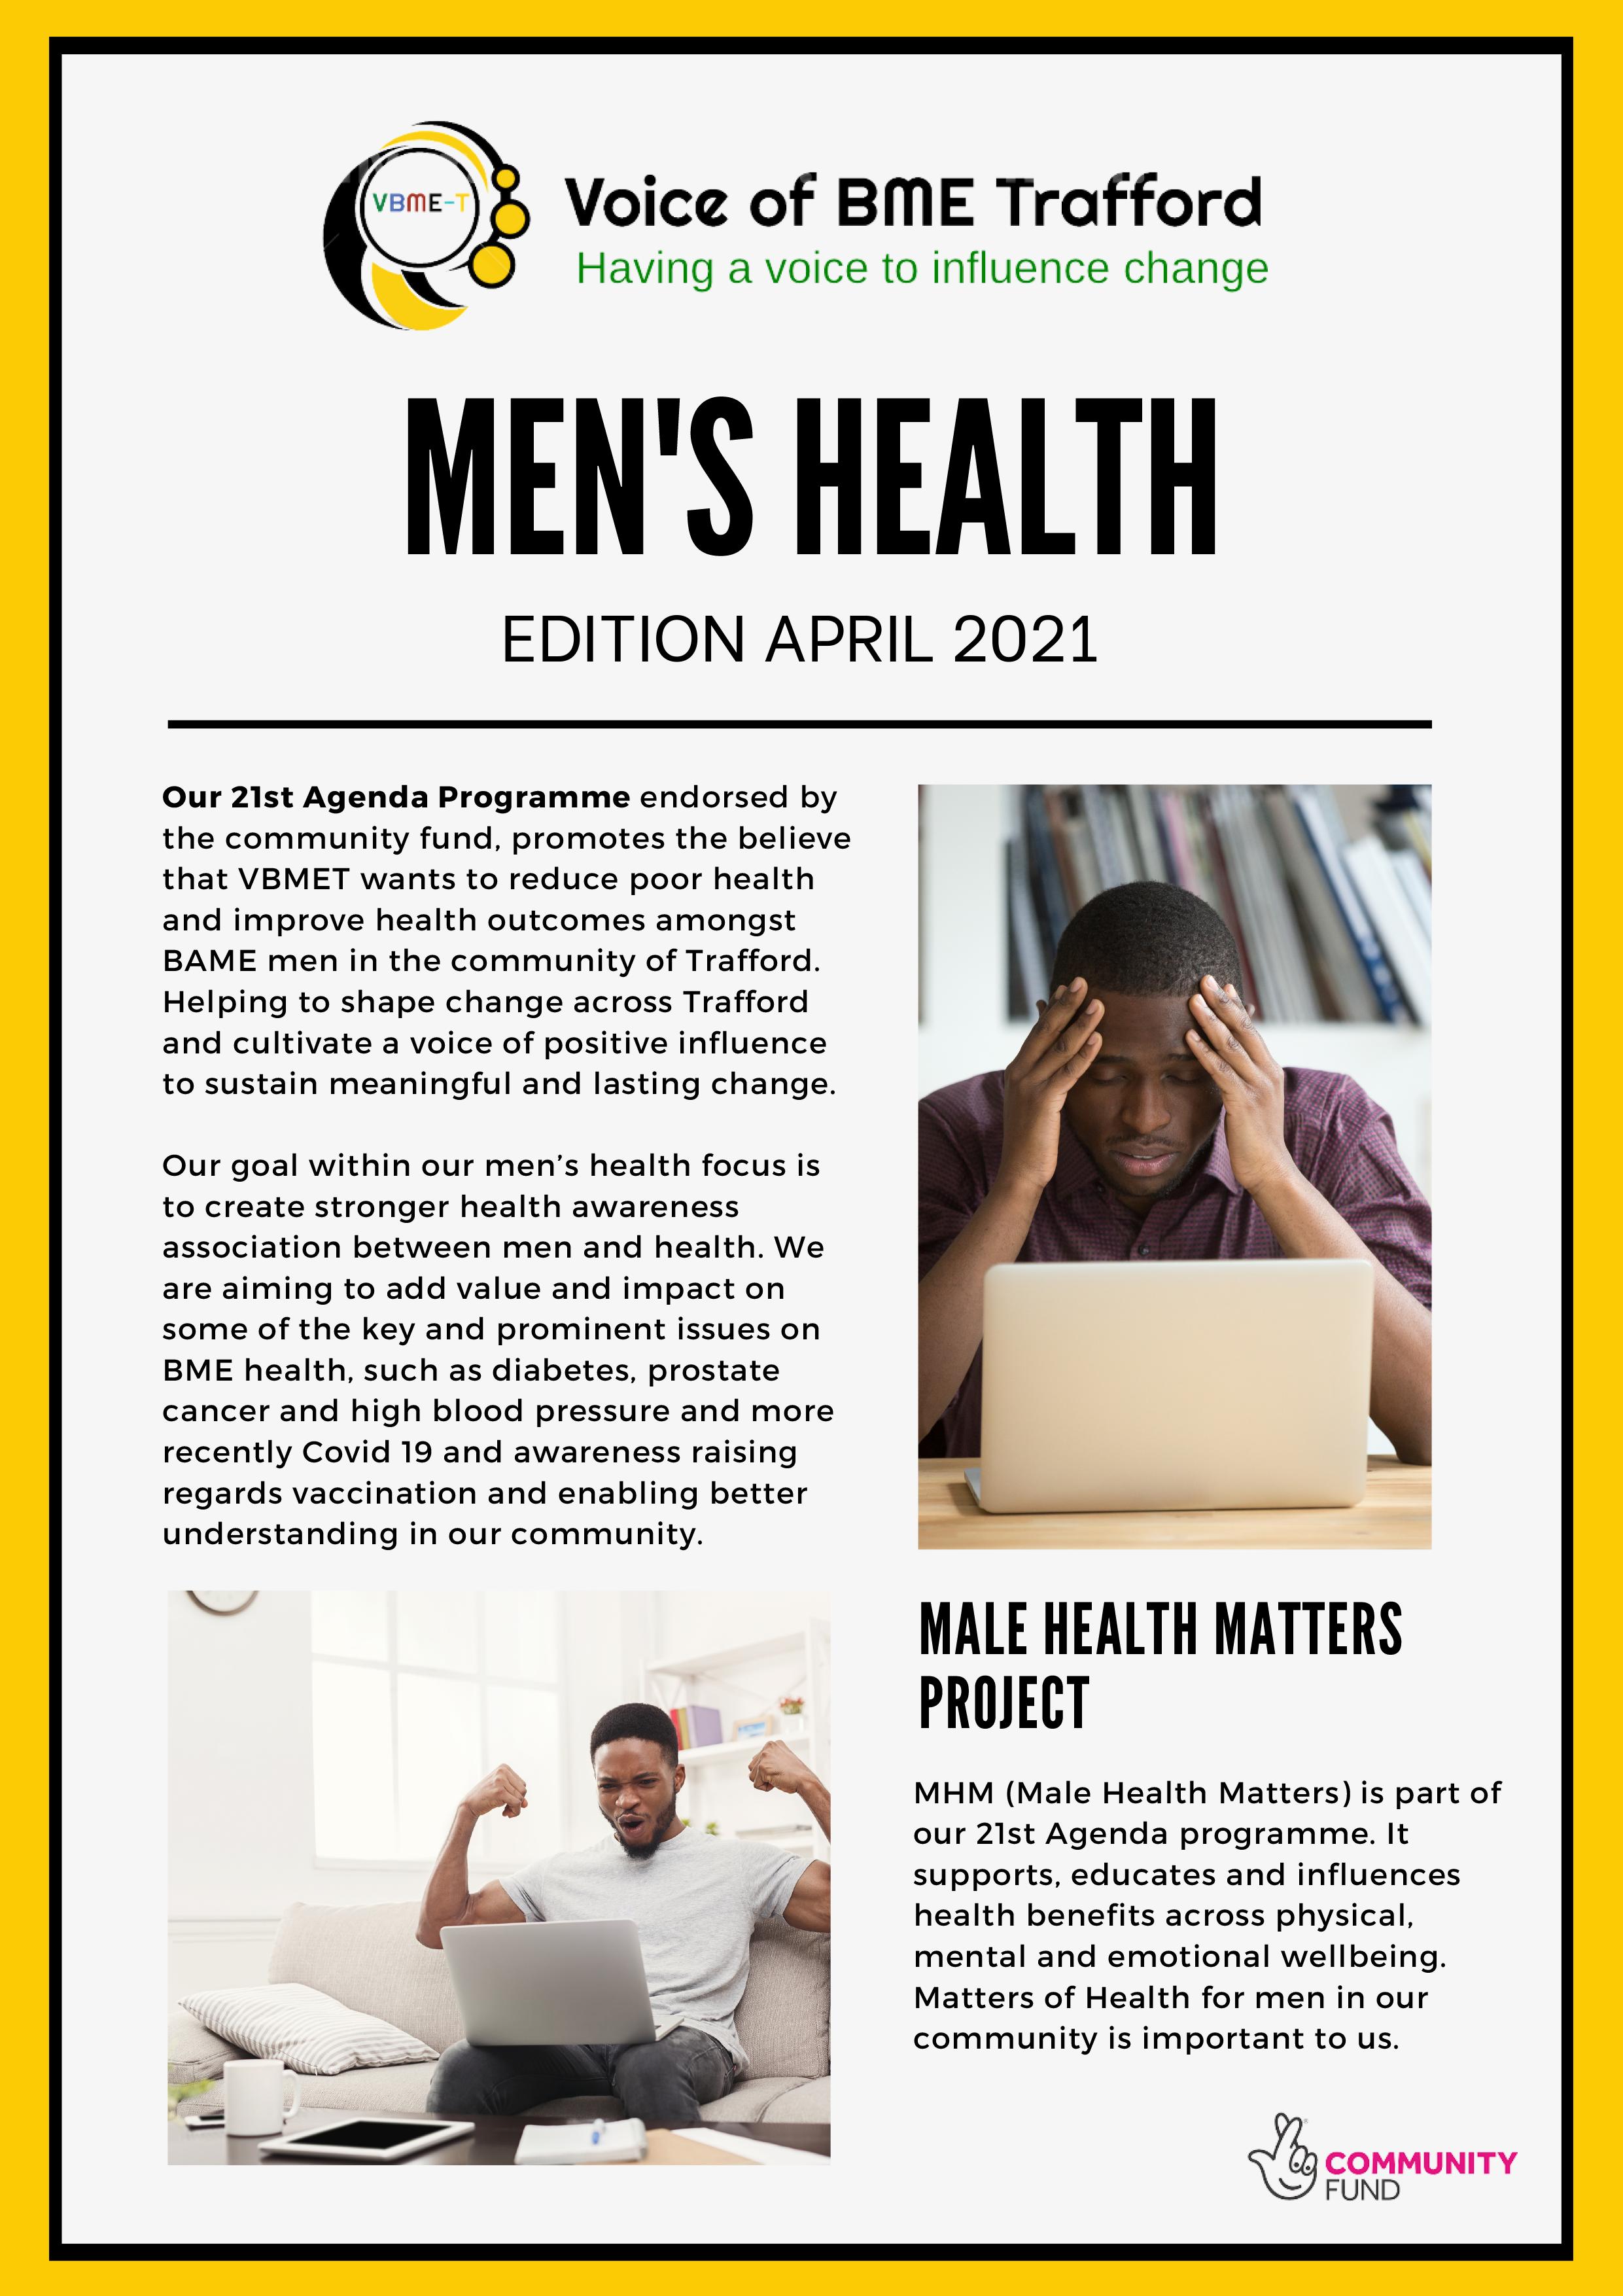 https://voicebmet.co.uk/home/wp-content/uploads/2021/05/VBMET-BROCHURE-Mens-Health-002-1.png